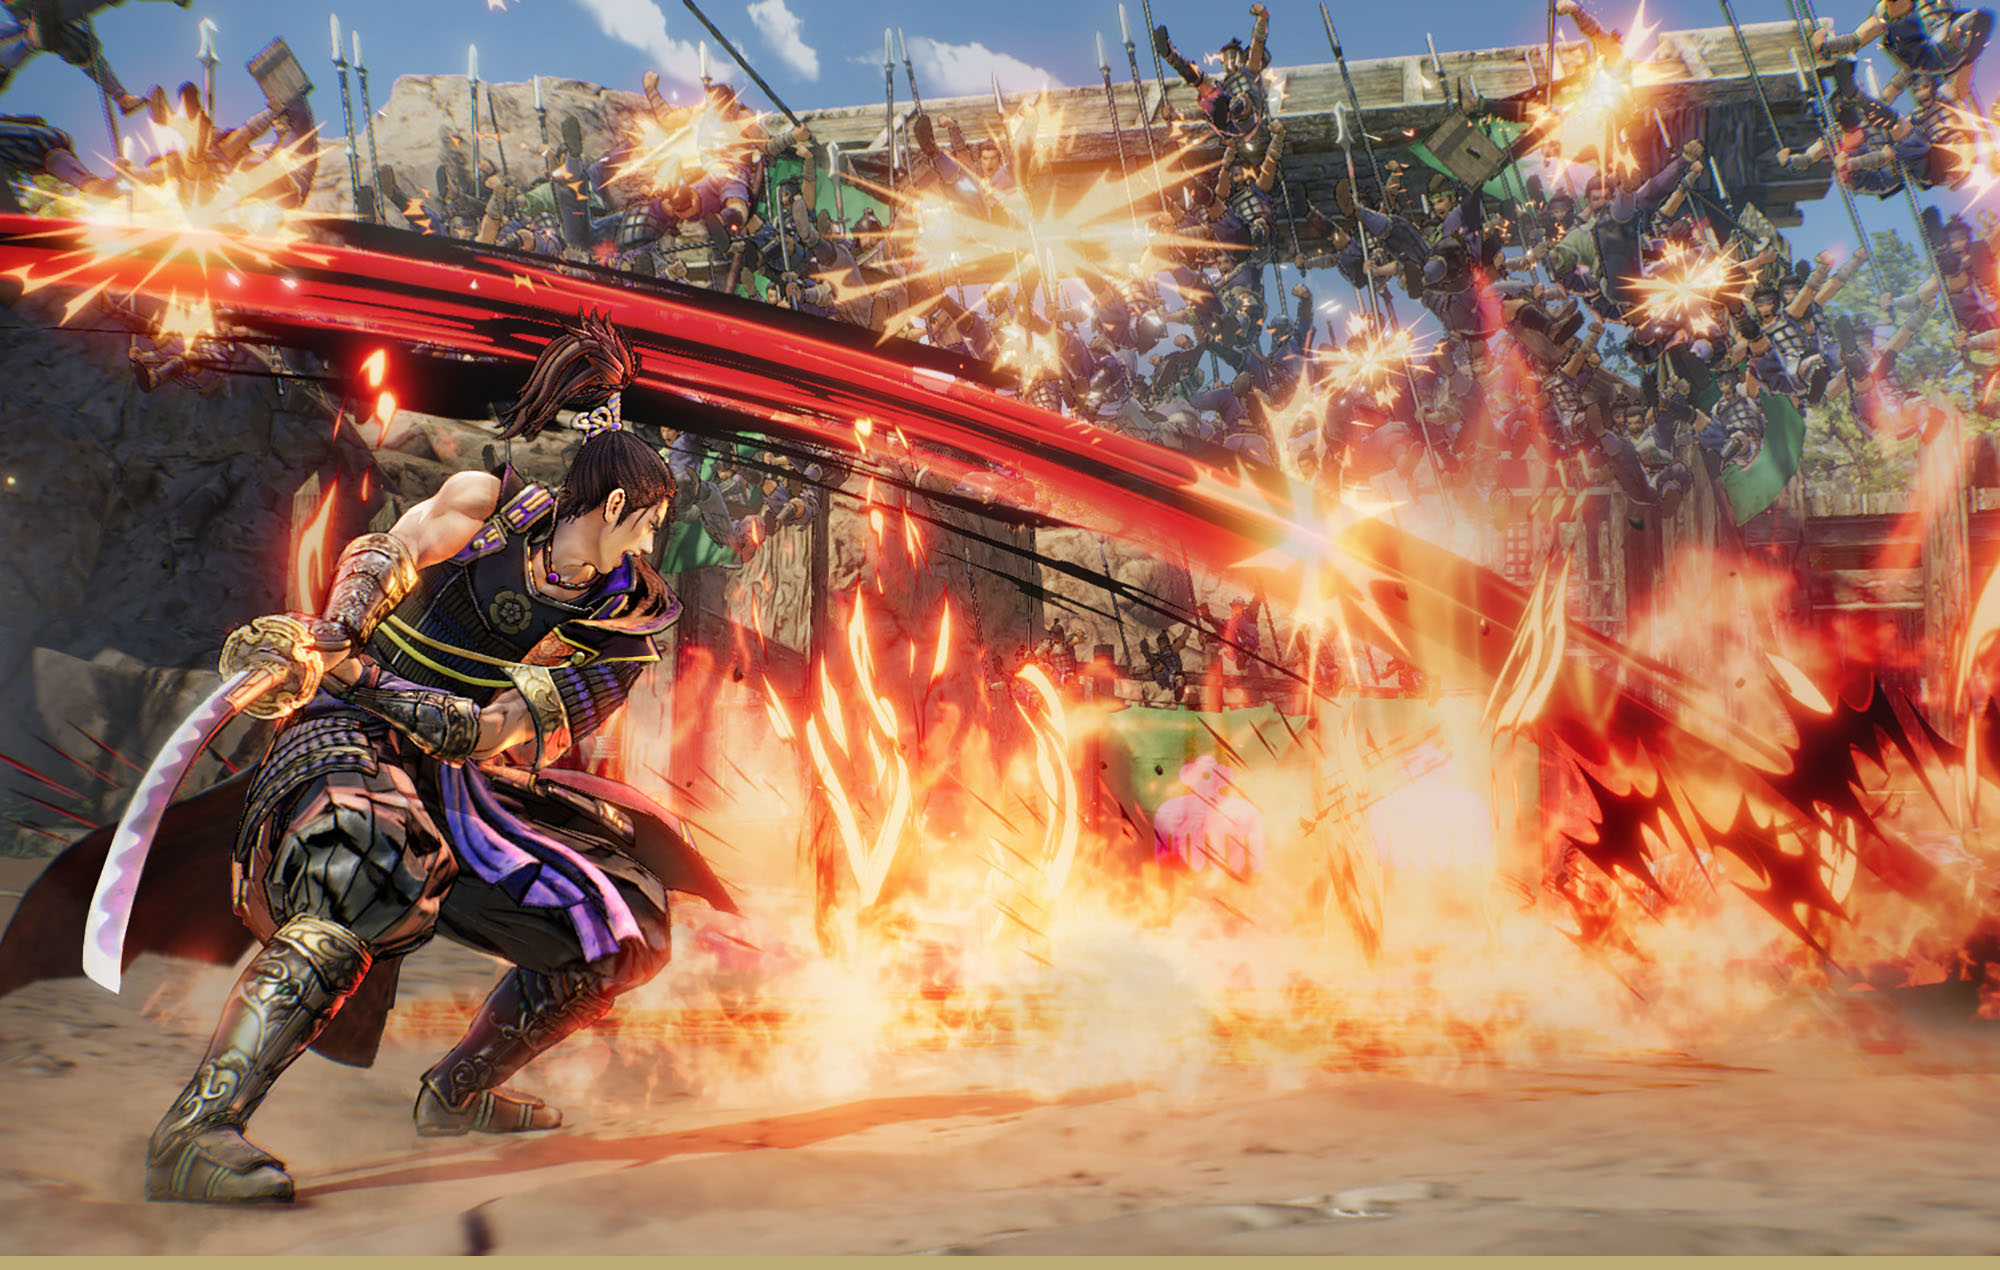 Samurai Warriors 5. Image Credit: Koei Tecmo